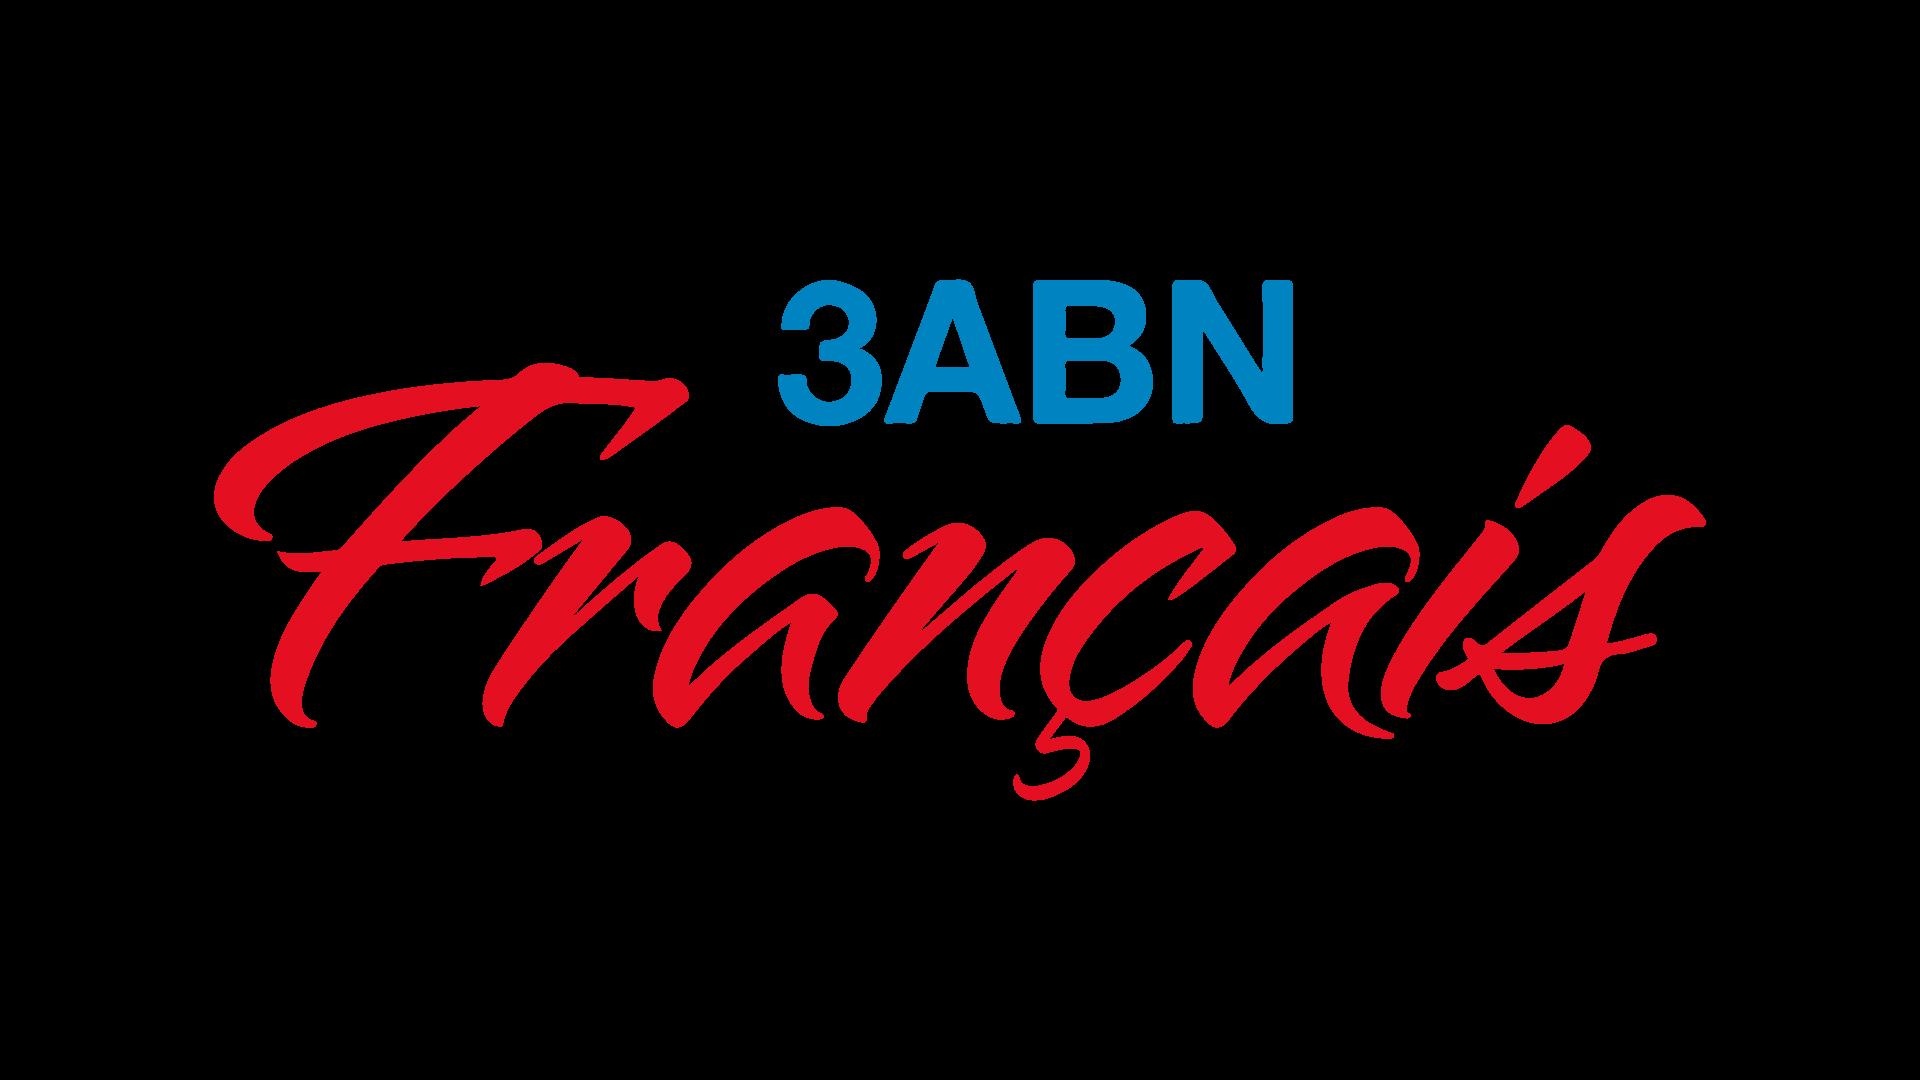 3ABN Français en directo, Online